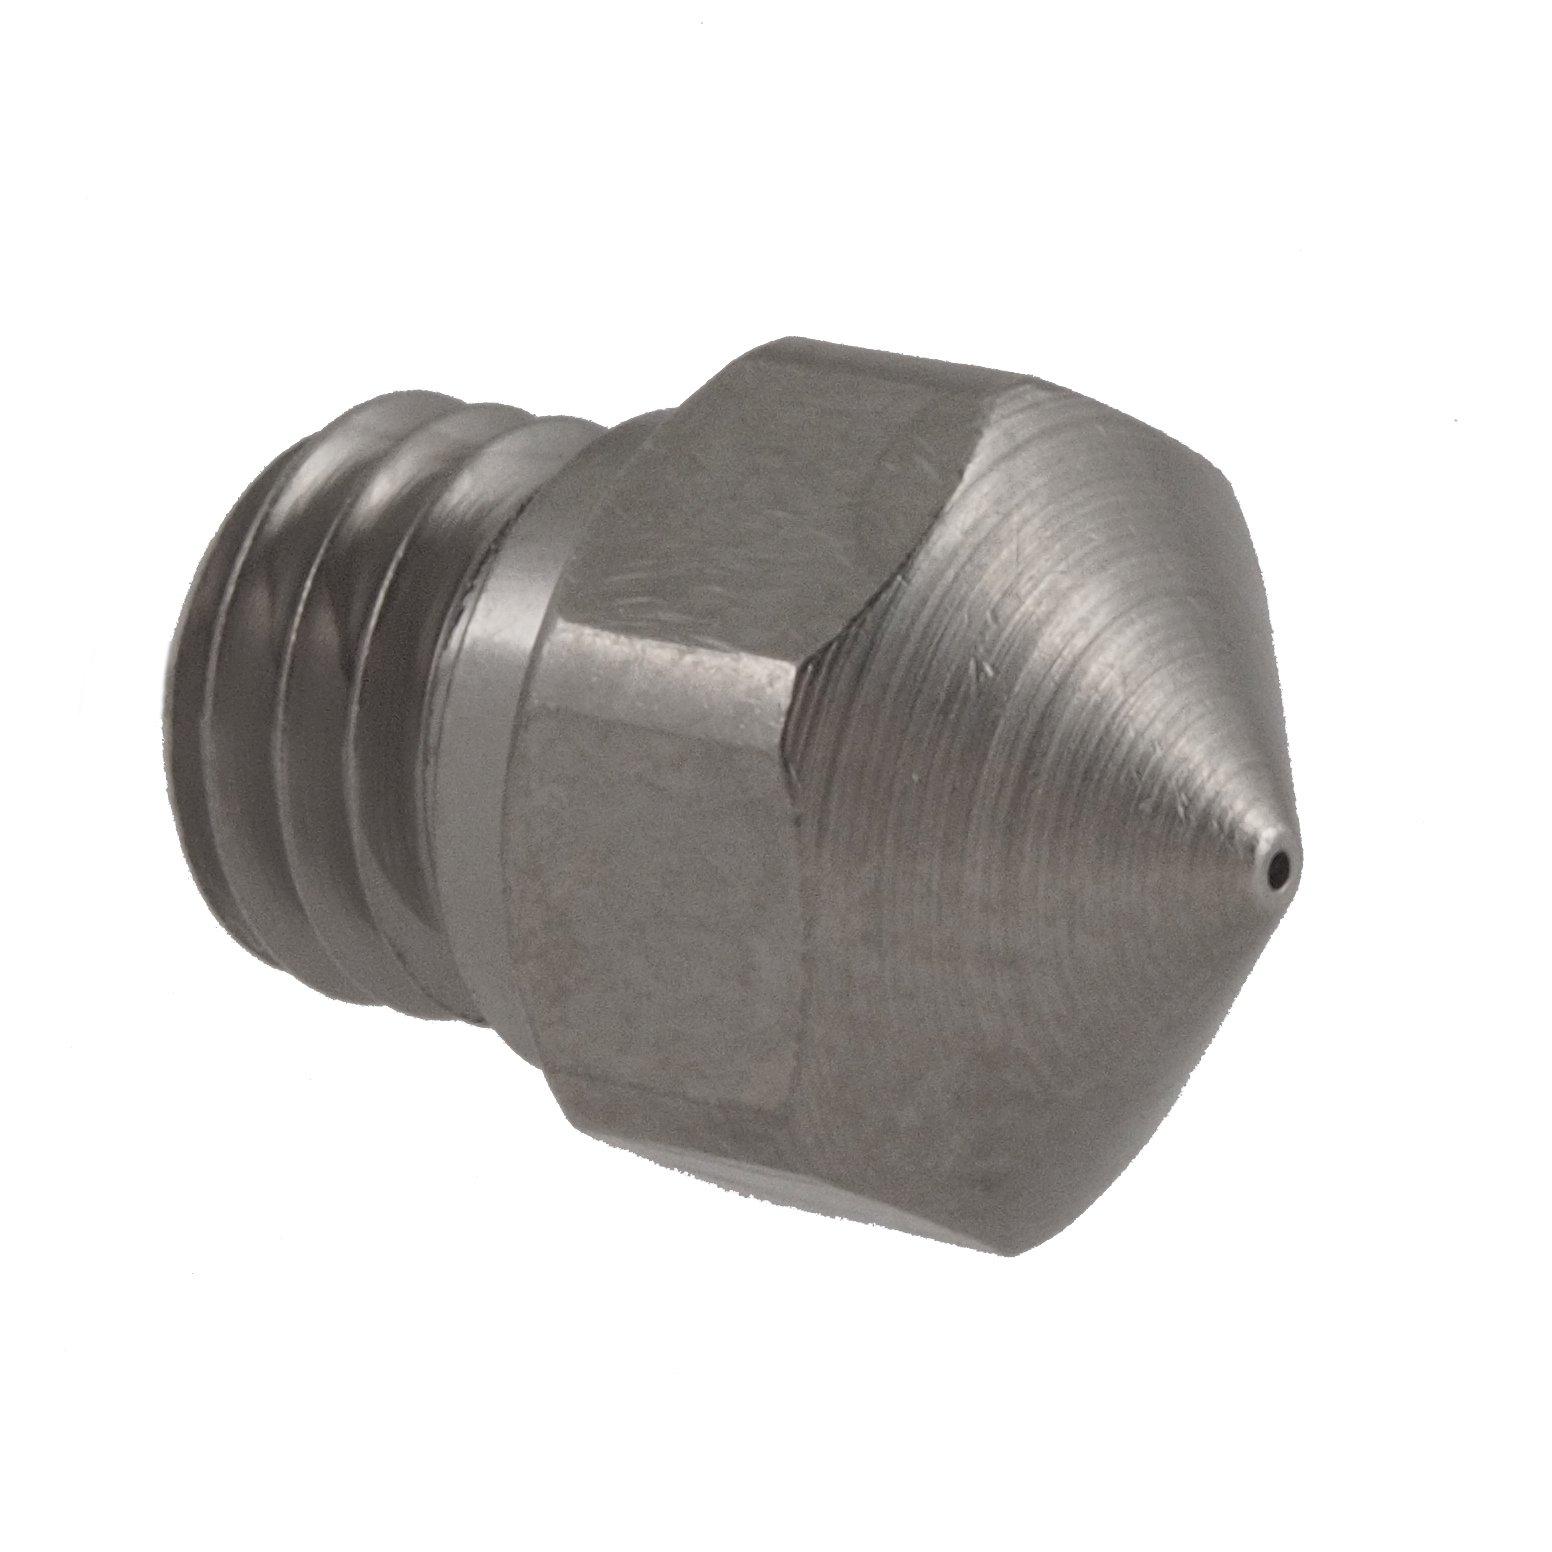 Micro-Swiss HW-NOZ-MK10-04 Plated Brass Wear Resistant Nozzles, 1.75 mm, MK10 (Flash Forge/Dremel/Wanhao) 0.4 mm, Bright Nickel